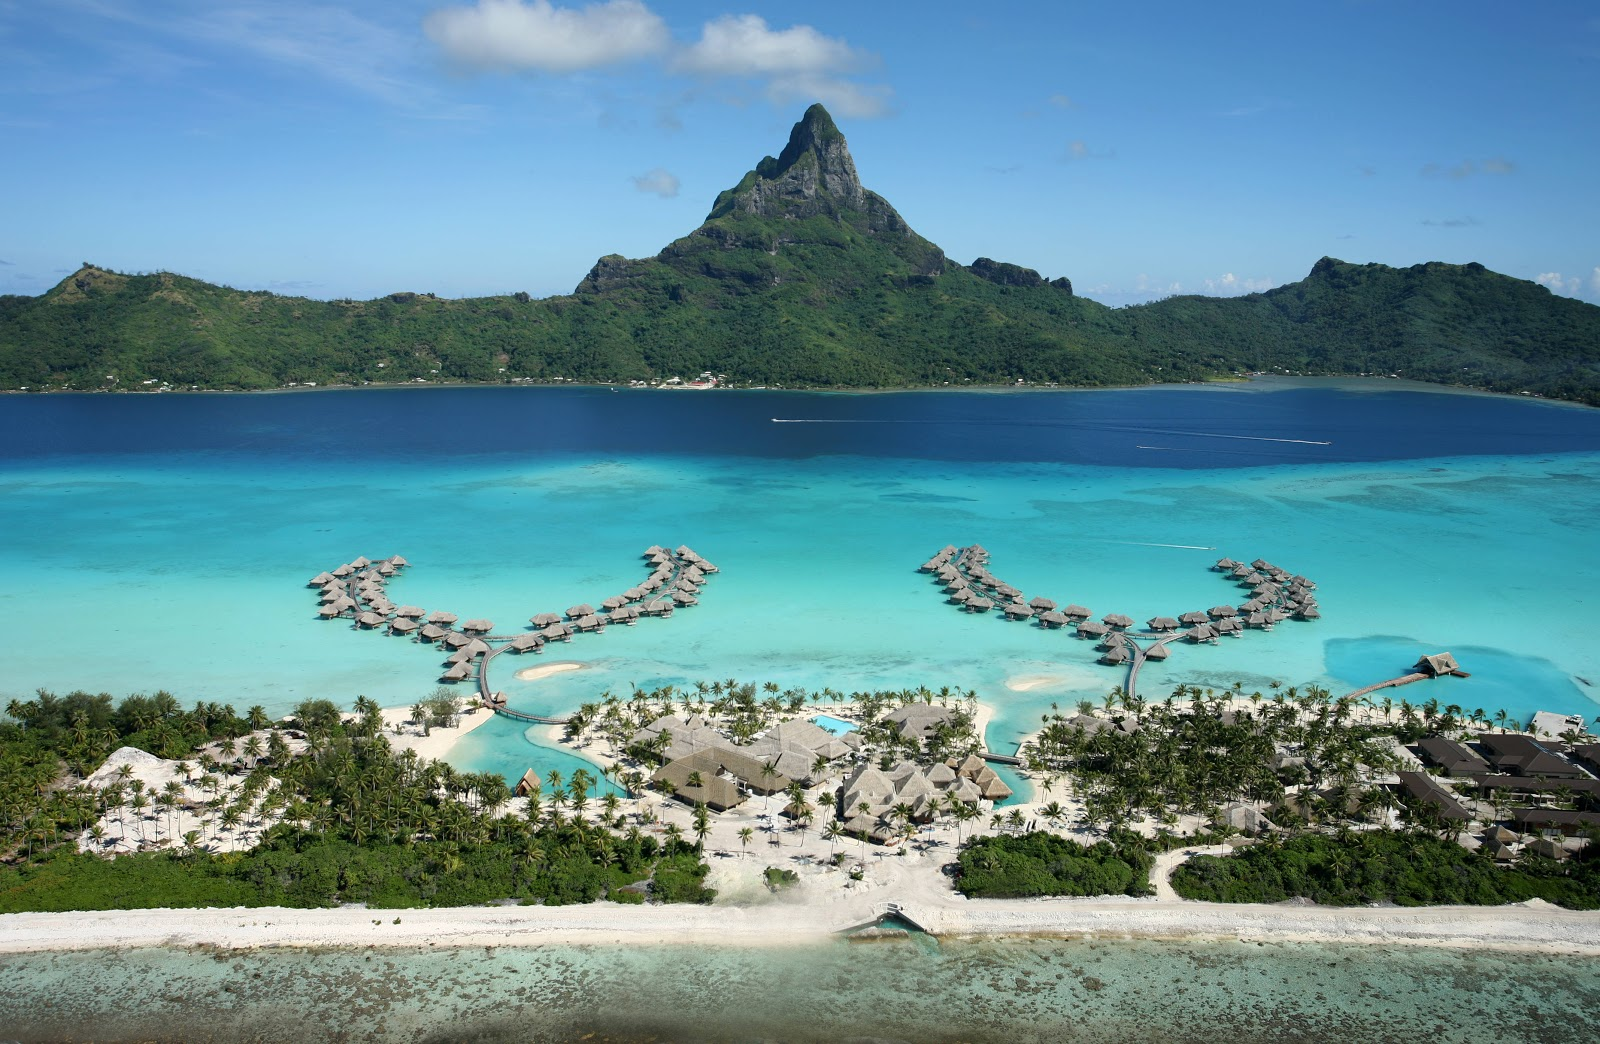 bora bora island and best beach hut resort the best beach. Black Bedroom Furniture Sets. Home Design Ideas